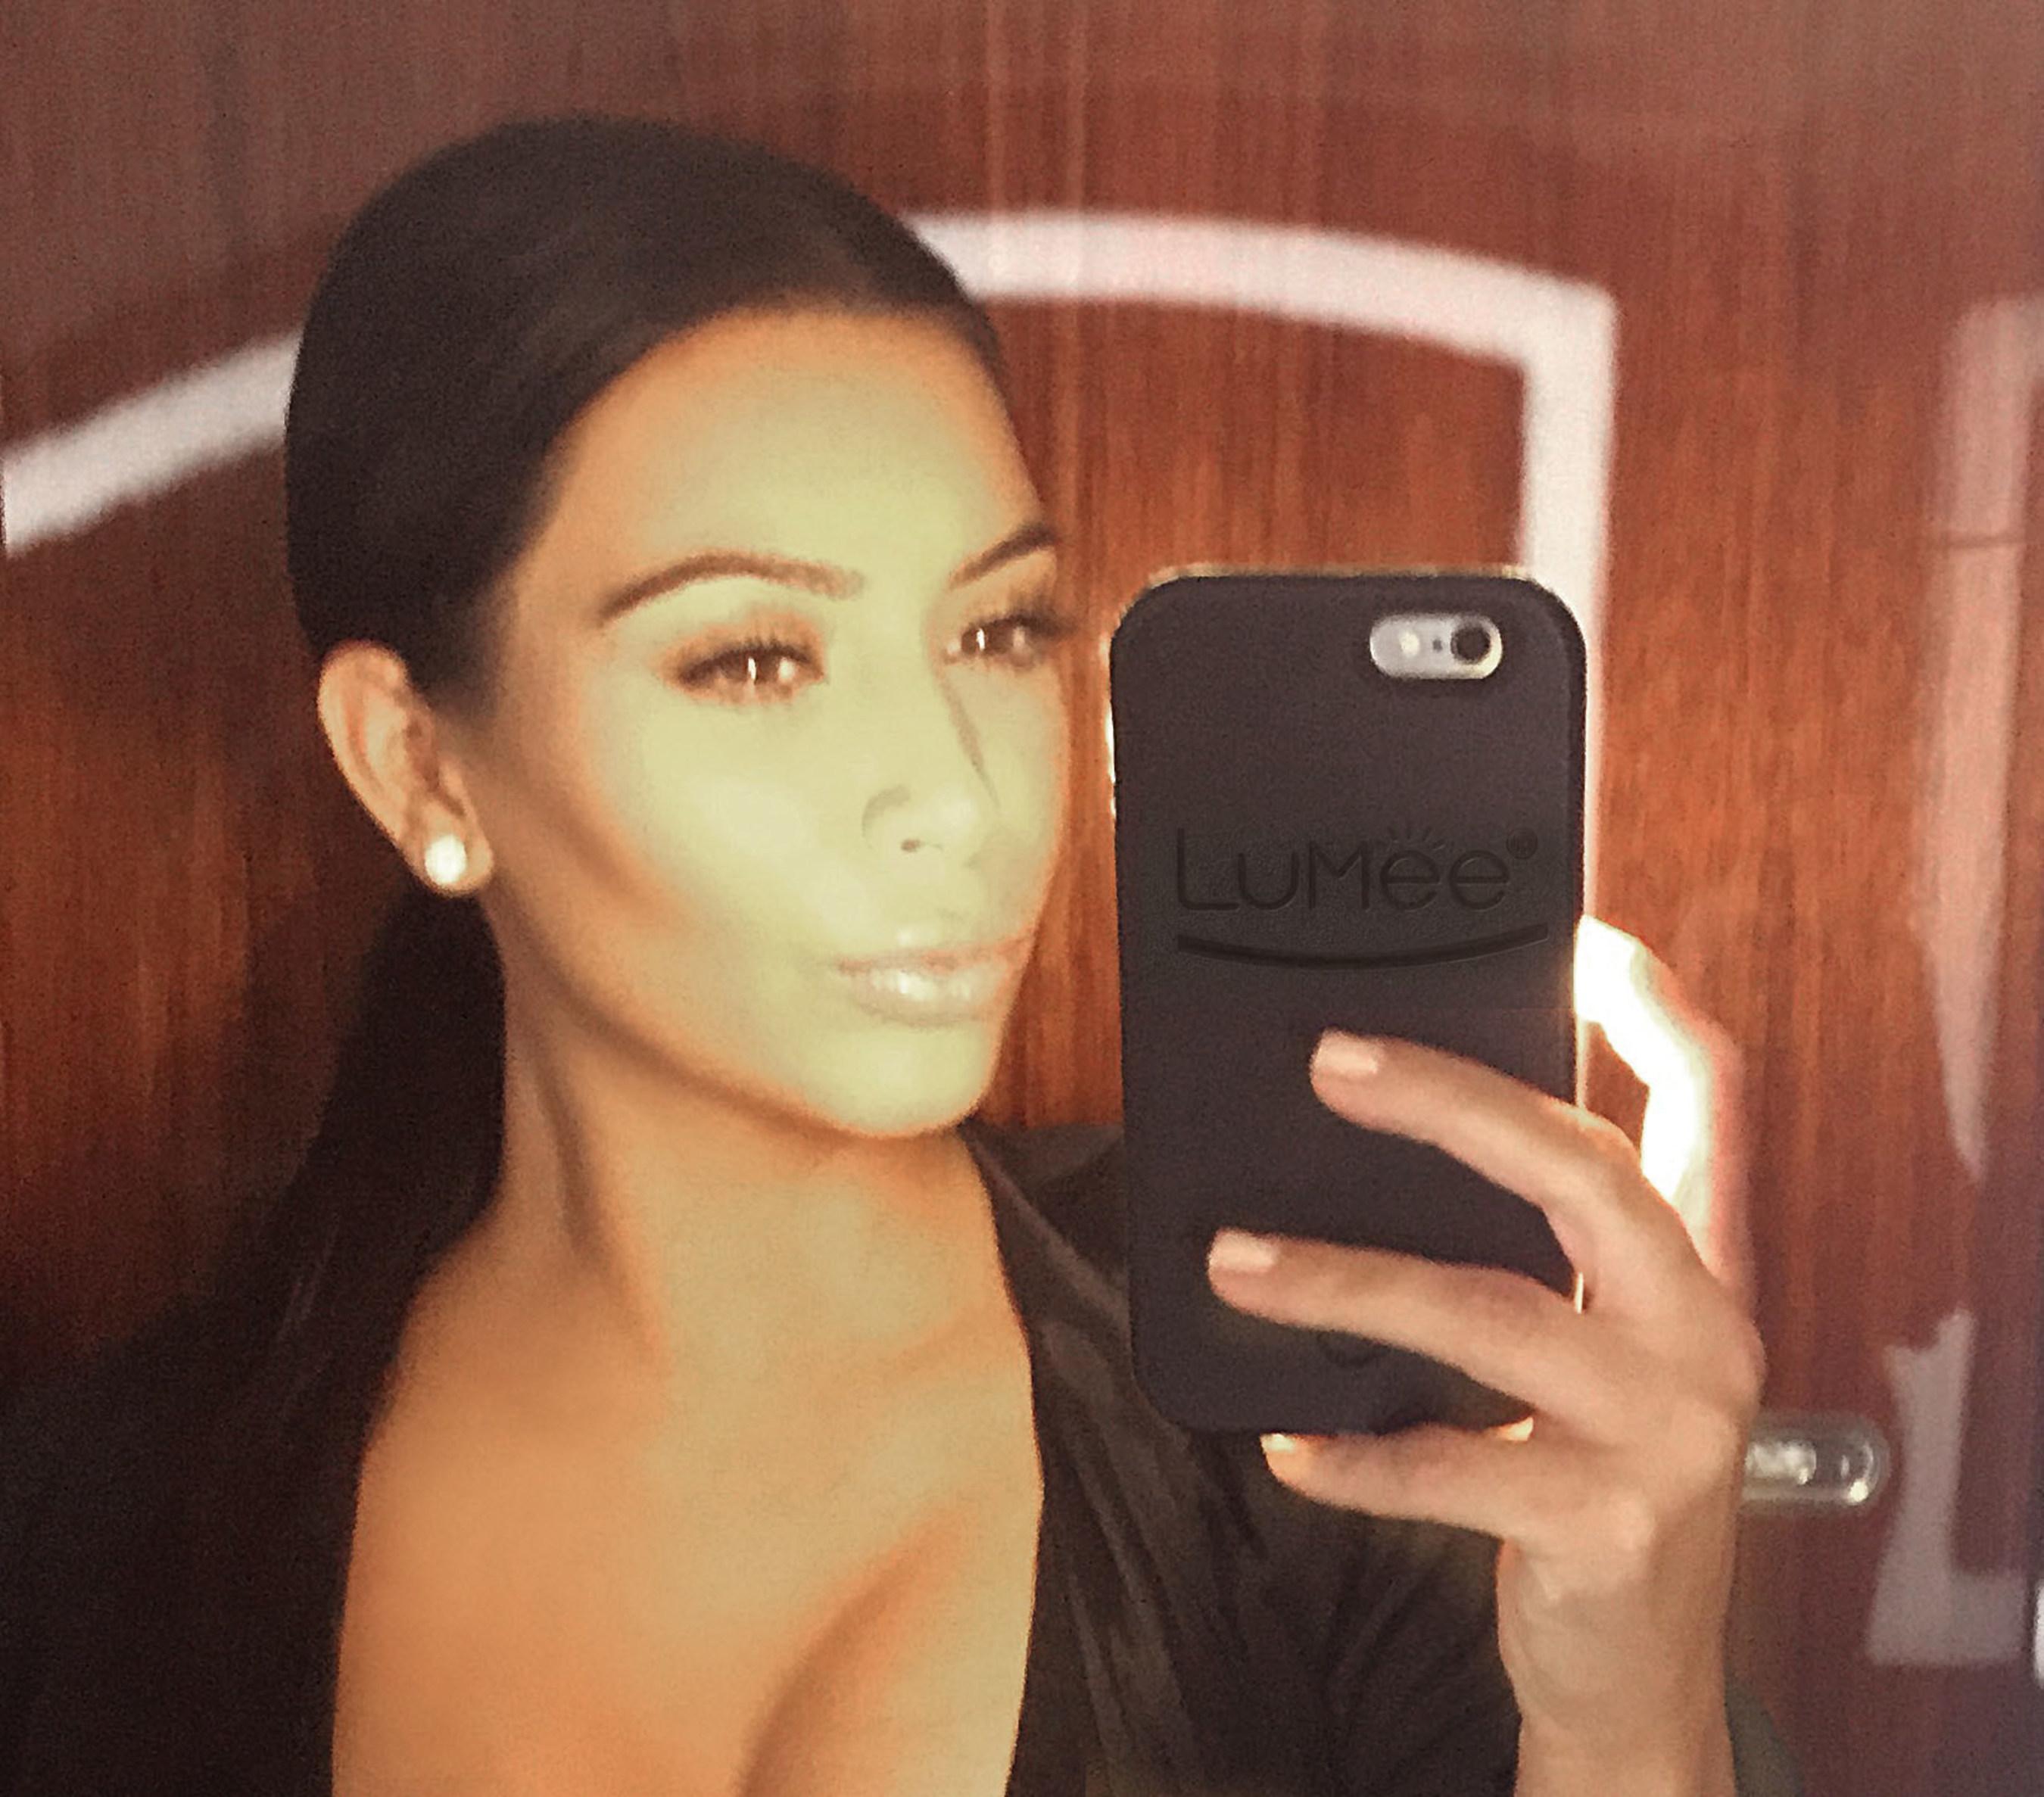 LuMee Case and Kim Kardashian West